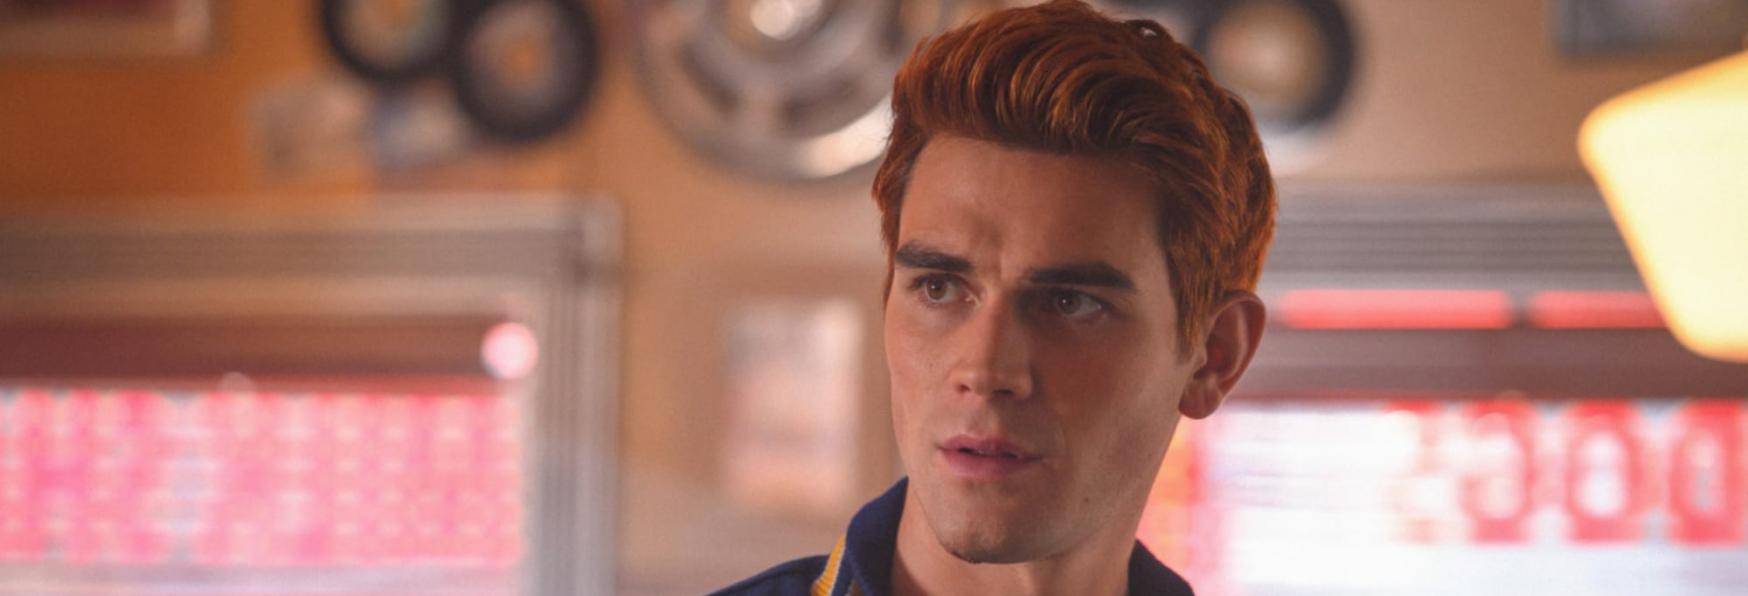 Riverdale 5: il Casting svela un Major Spoiler riguardante Archie